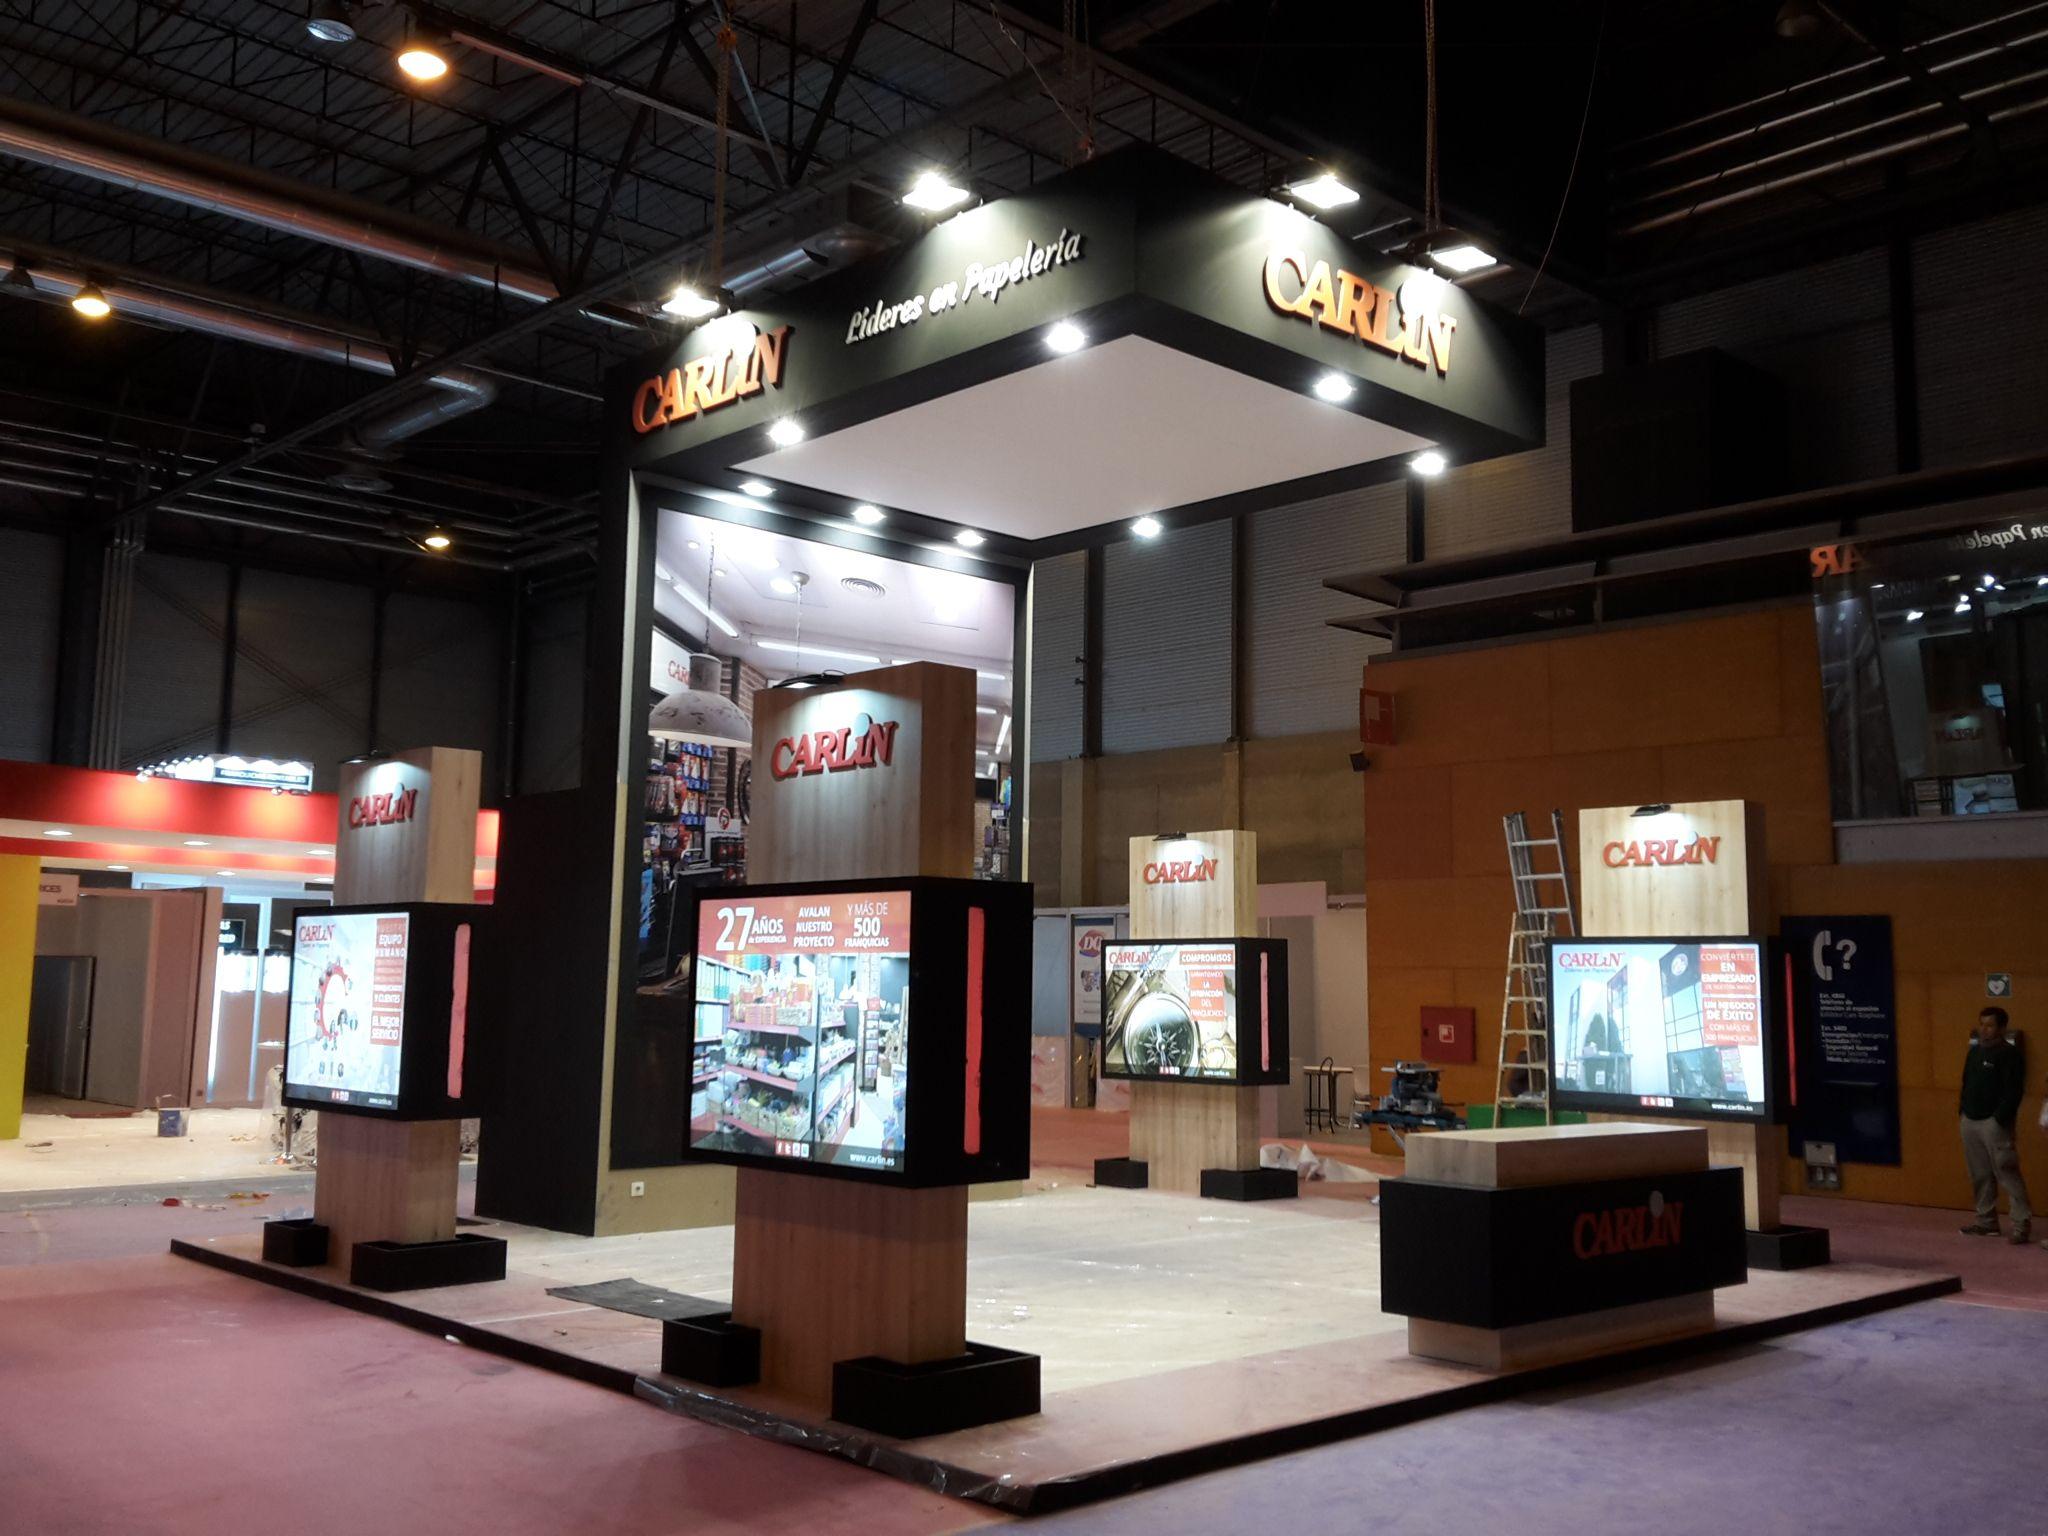 Decoraciones Expo Stands S L : Manuel prieto gp stands